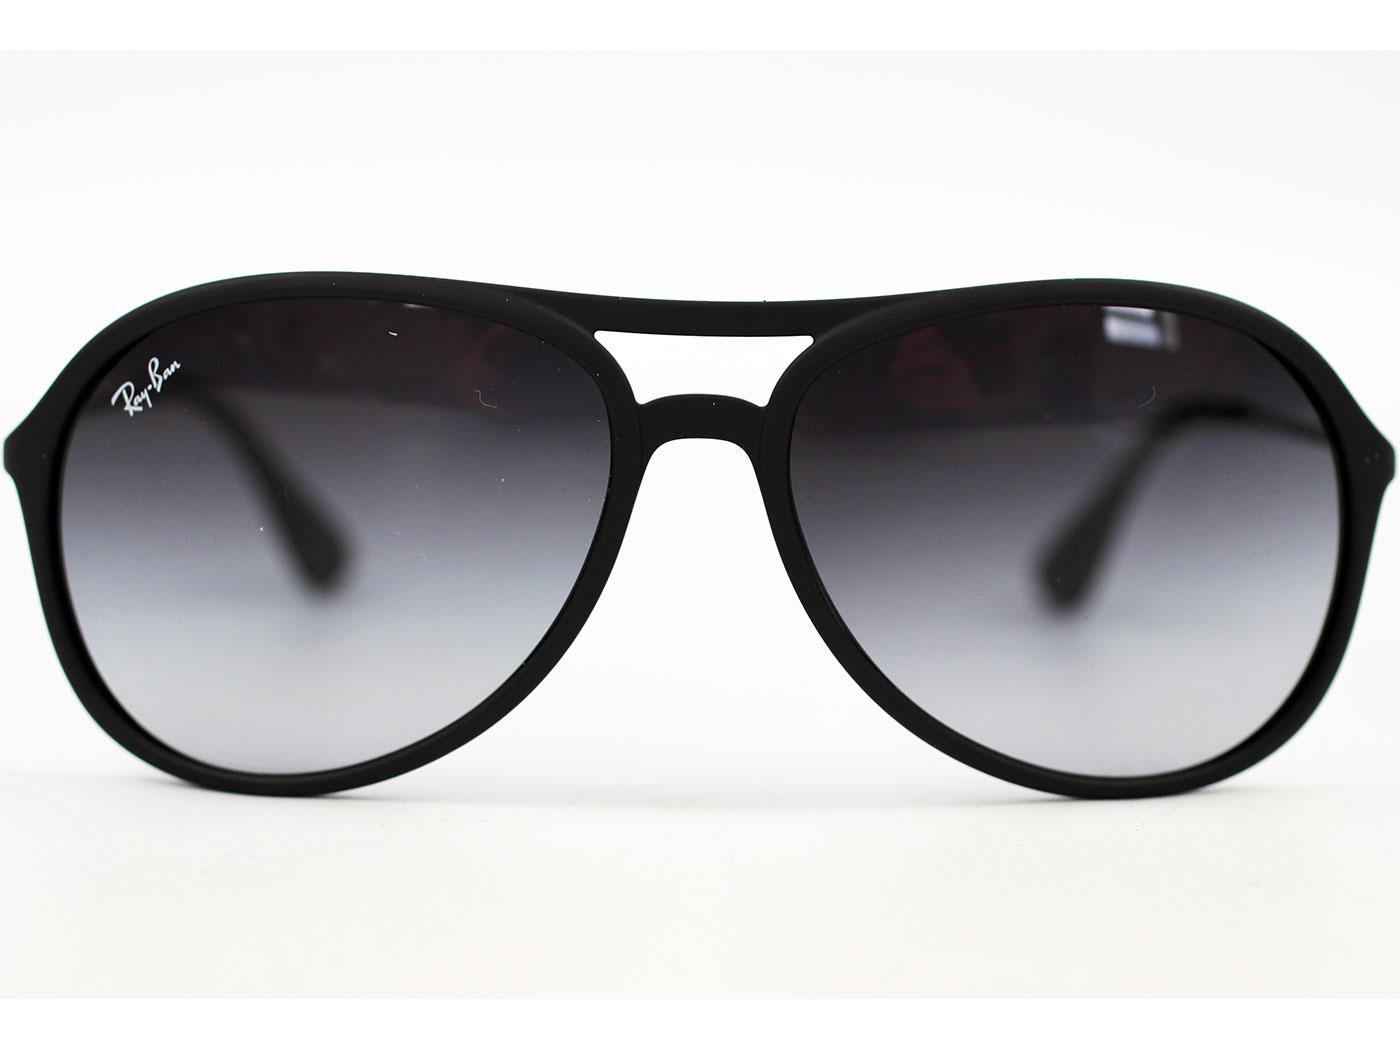 5a9b97d7d9 Ray-Ban Alex Retro Indie Mod Cats Aviator RB4201 Sunglasses Black